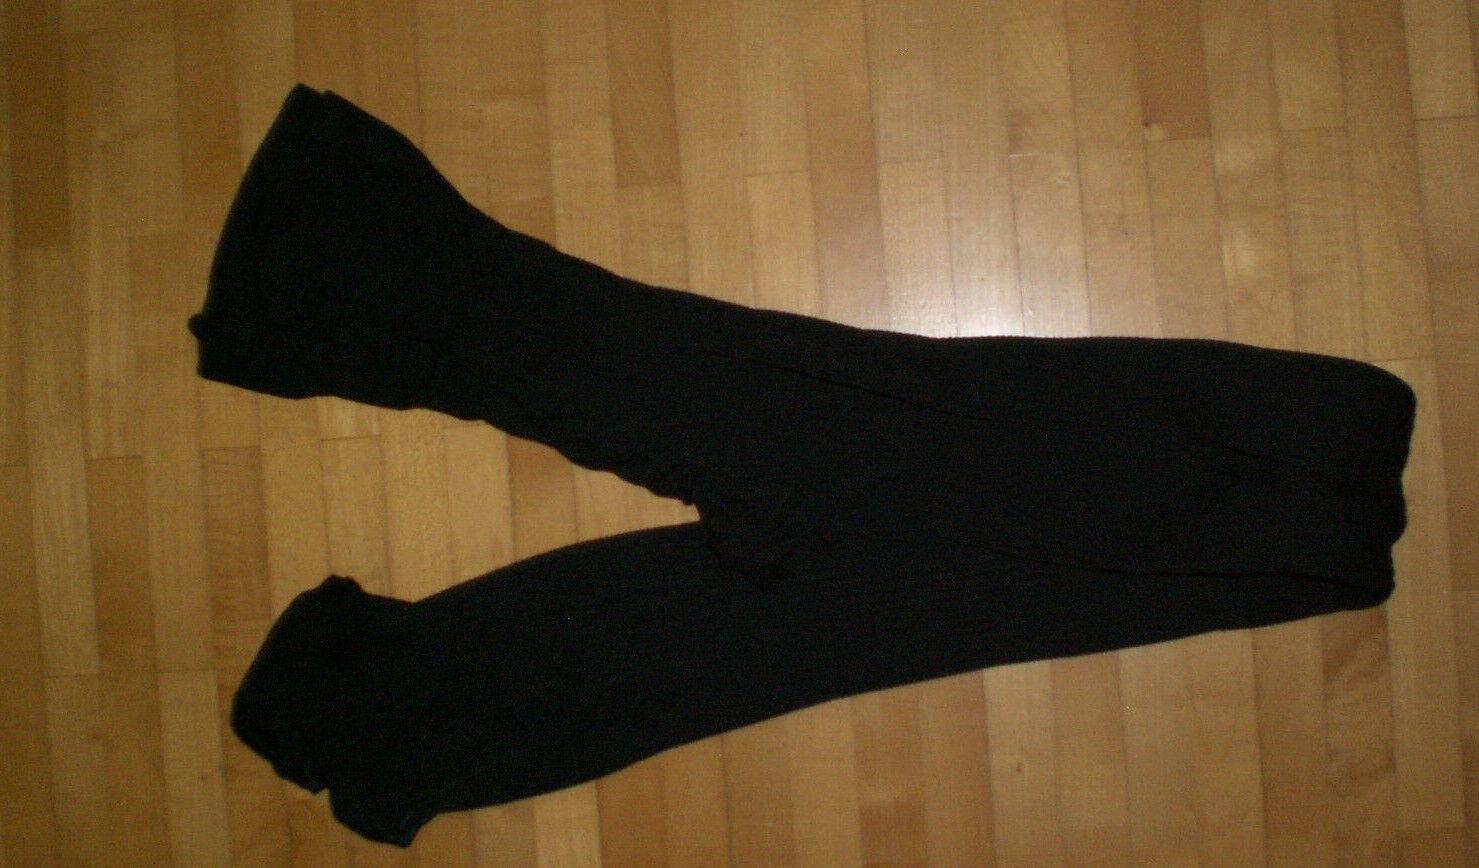 ZARA Damen schwarze Strumpfhose Strümpfe Gr. 36/38 S M NEU